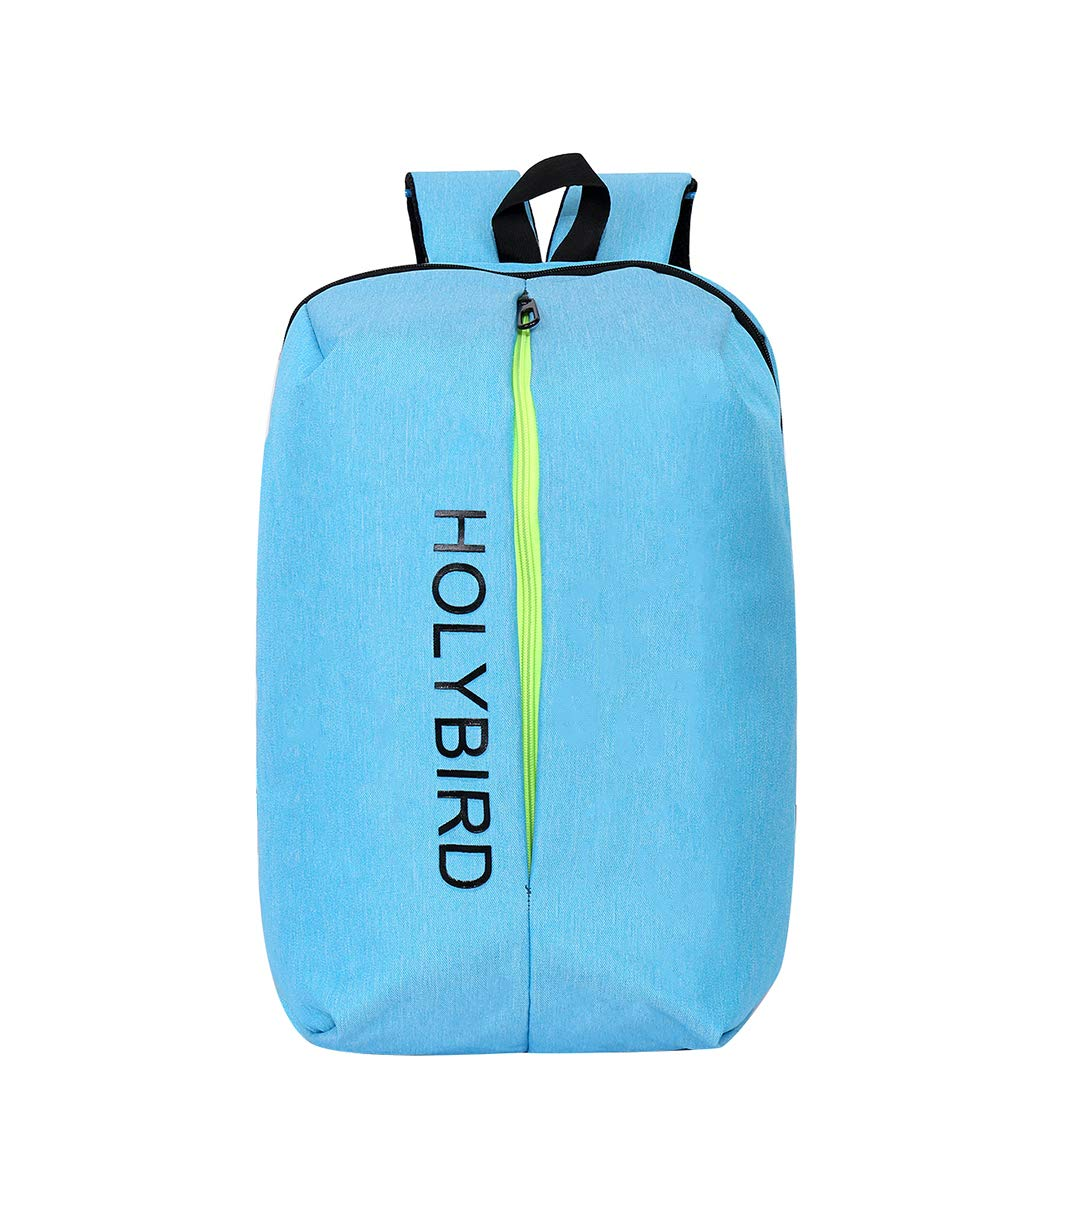 bluee HOLYBIRD Waterproof Backpack PU Leather Mini Women Purse for School Shopping Dating